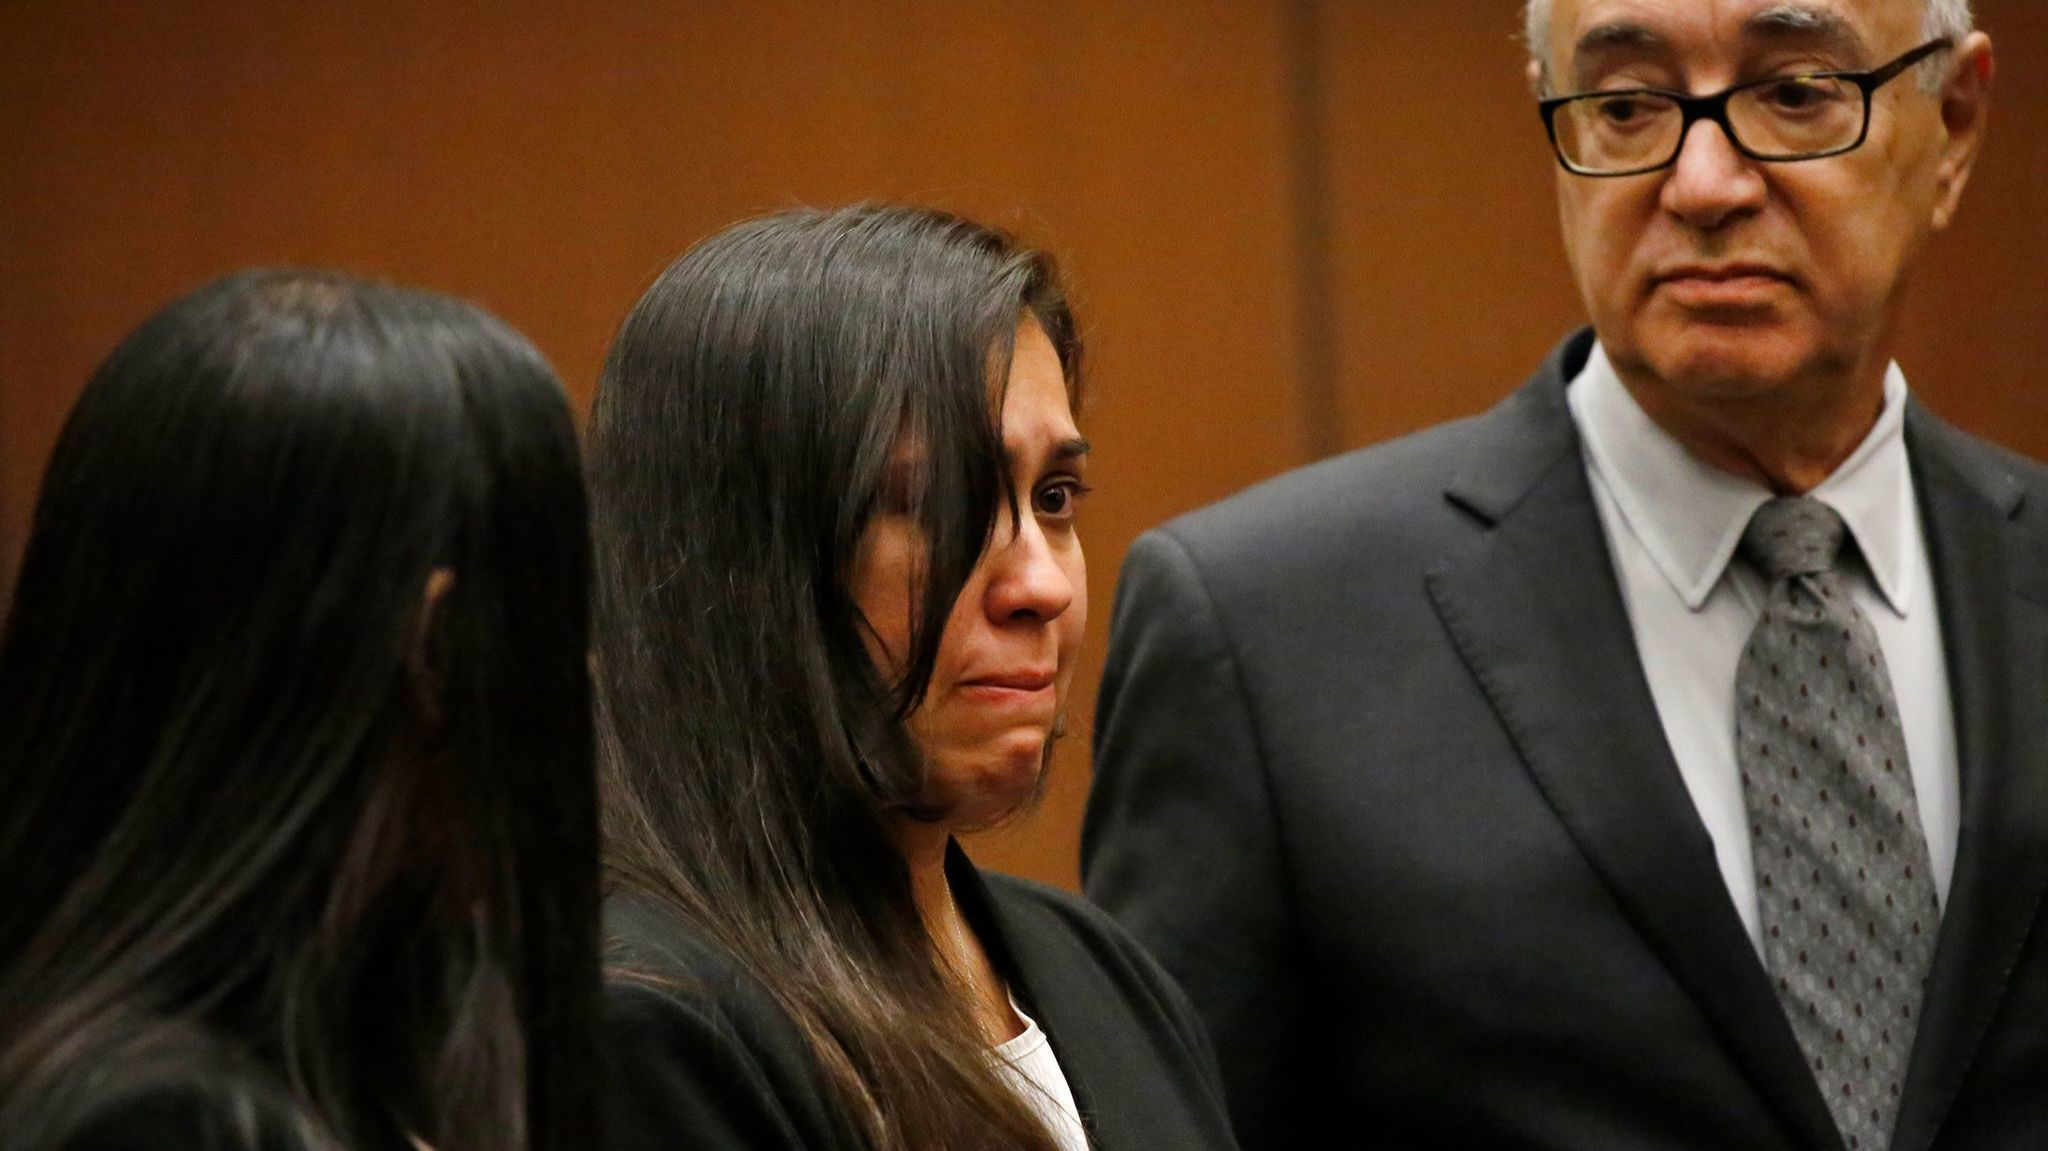 Under A Plea Deal The Wife Of Slain Bell Gardens Mayor